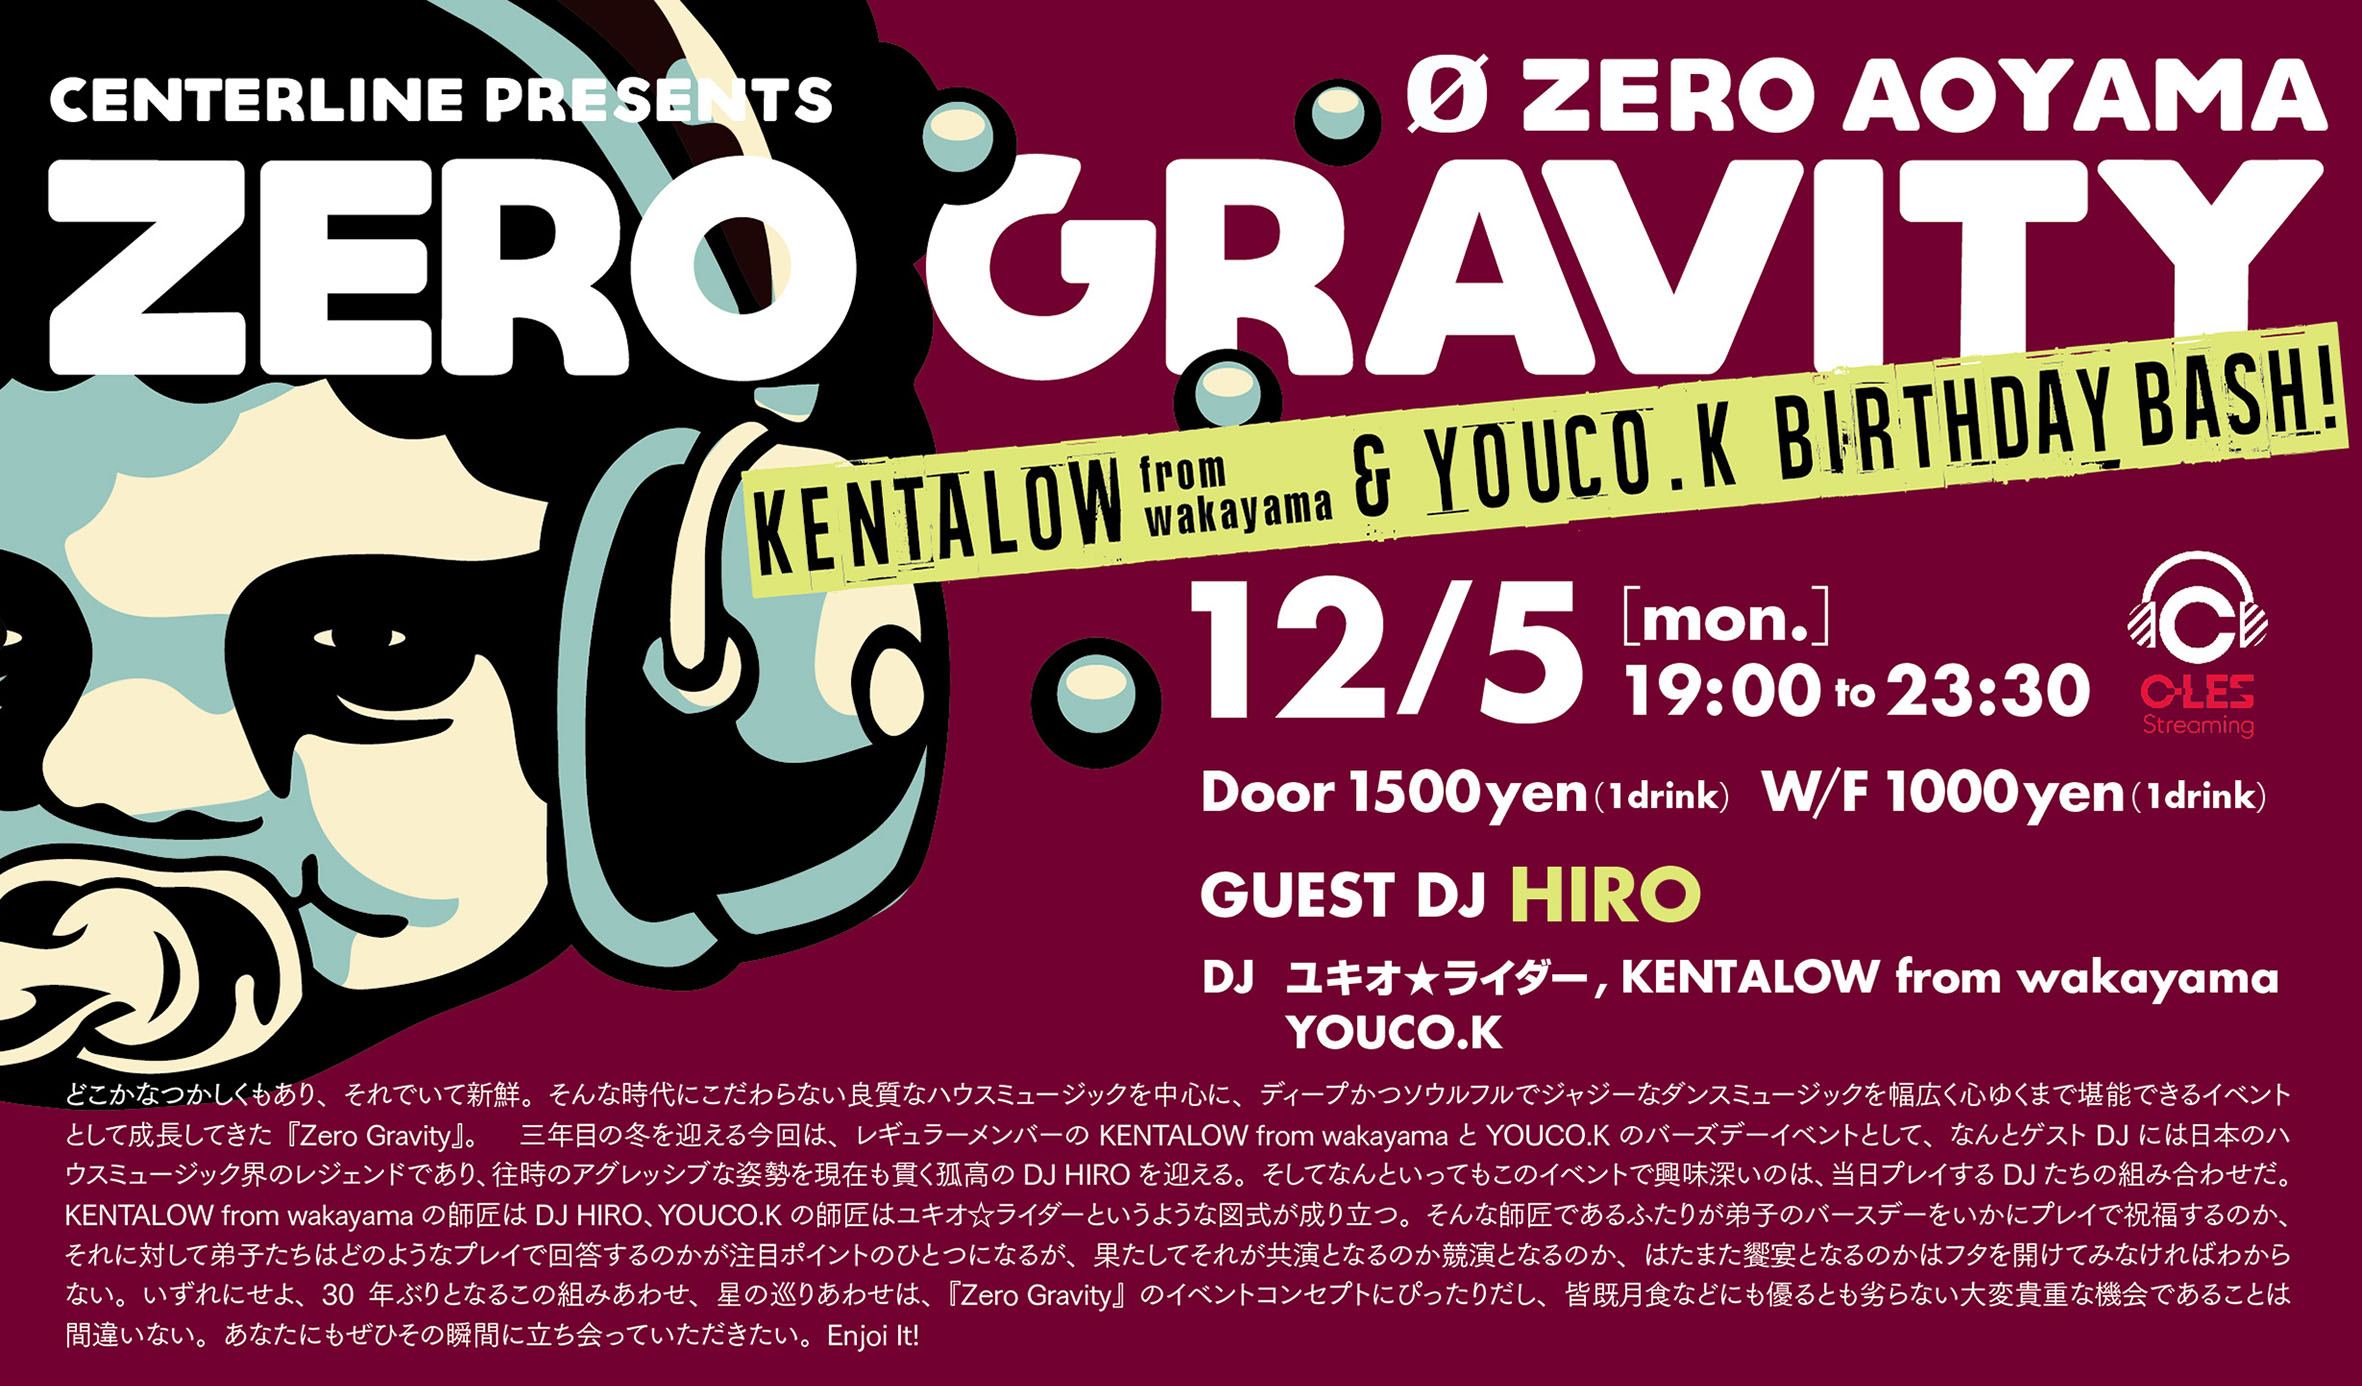 ZERO GRAVITY   KENTALOW from wakayama & YOUCO.K  Birth Bash!